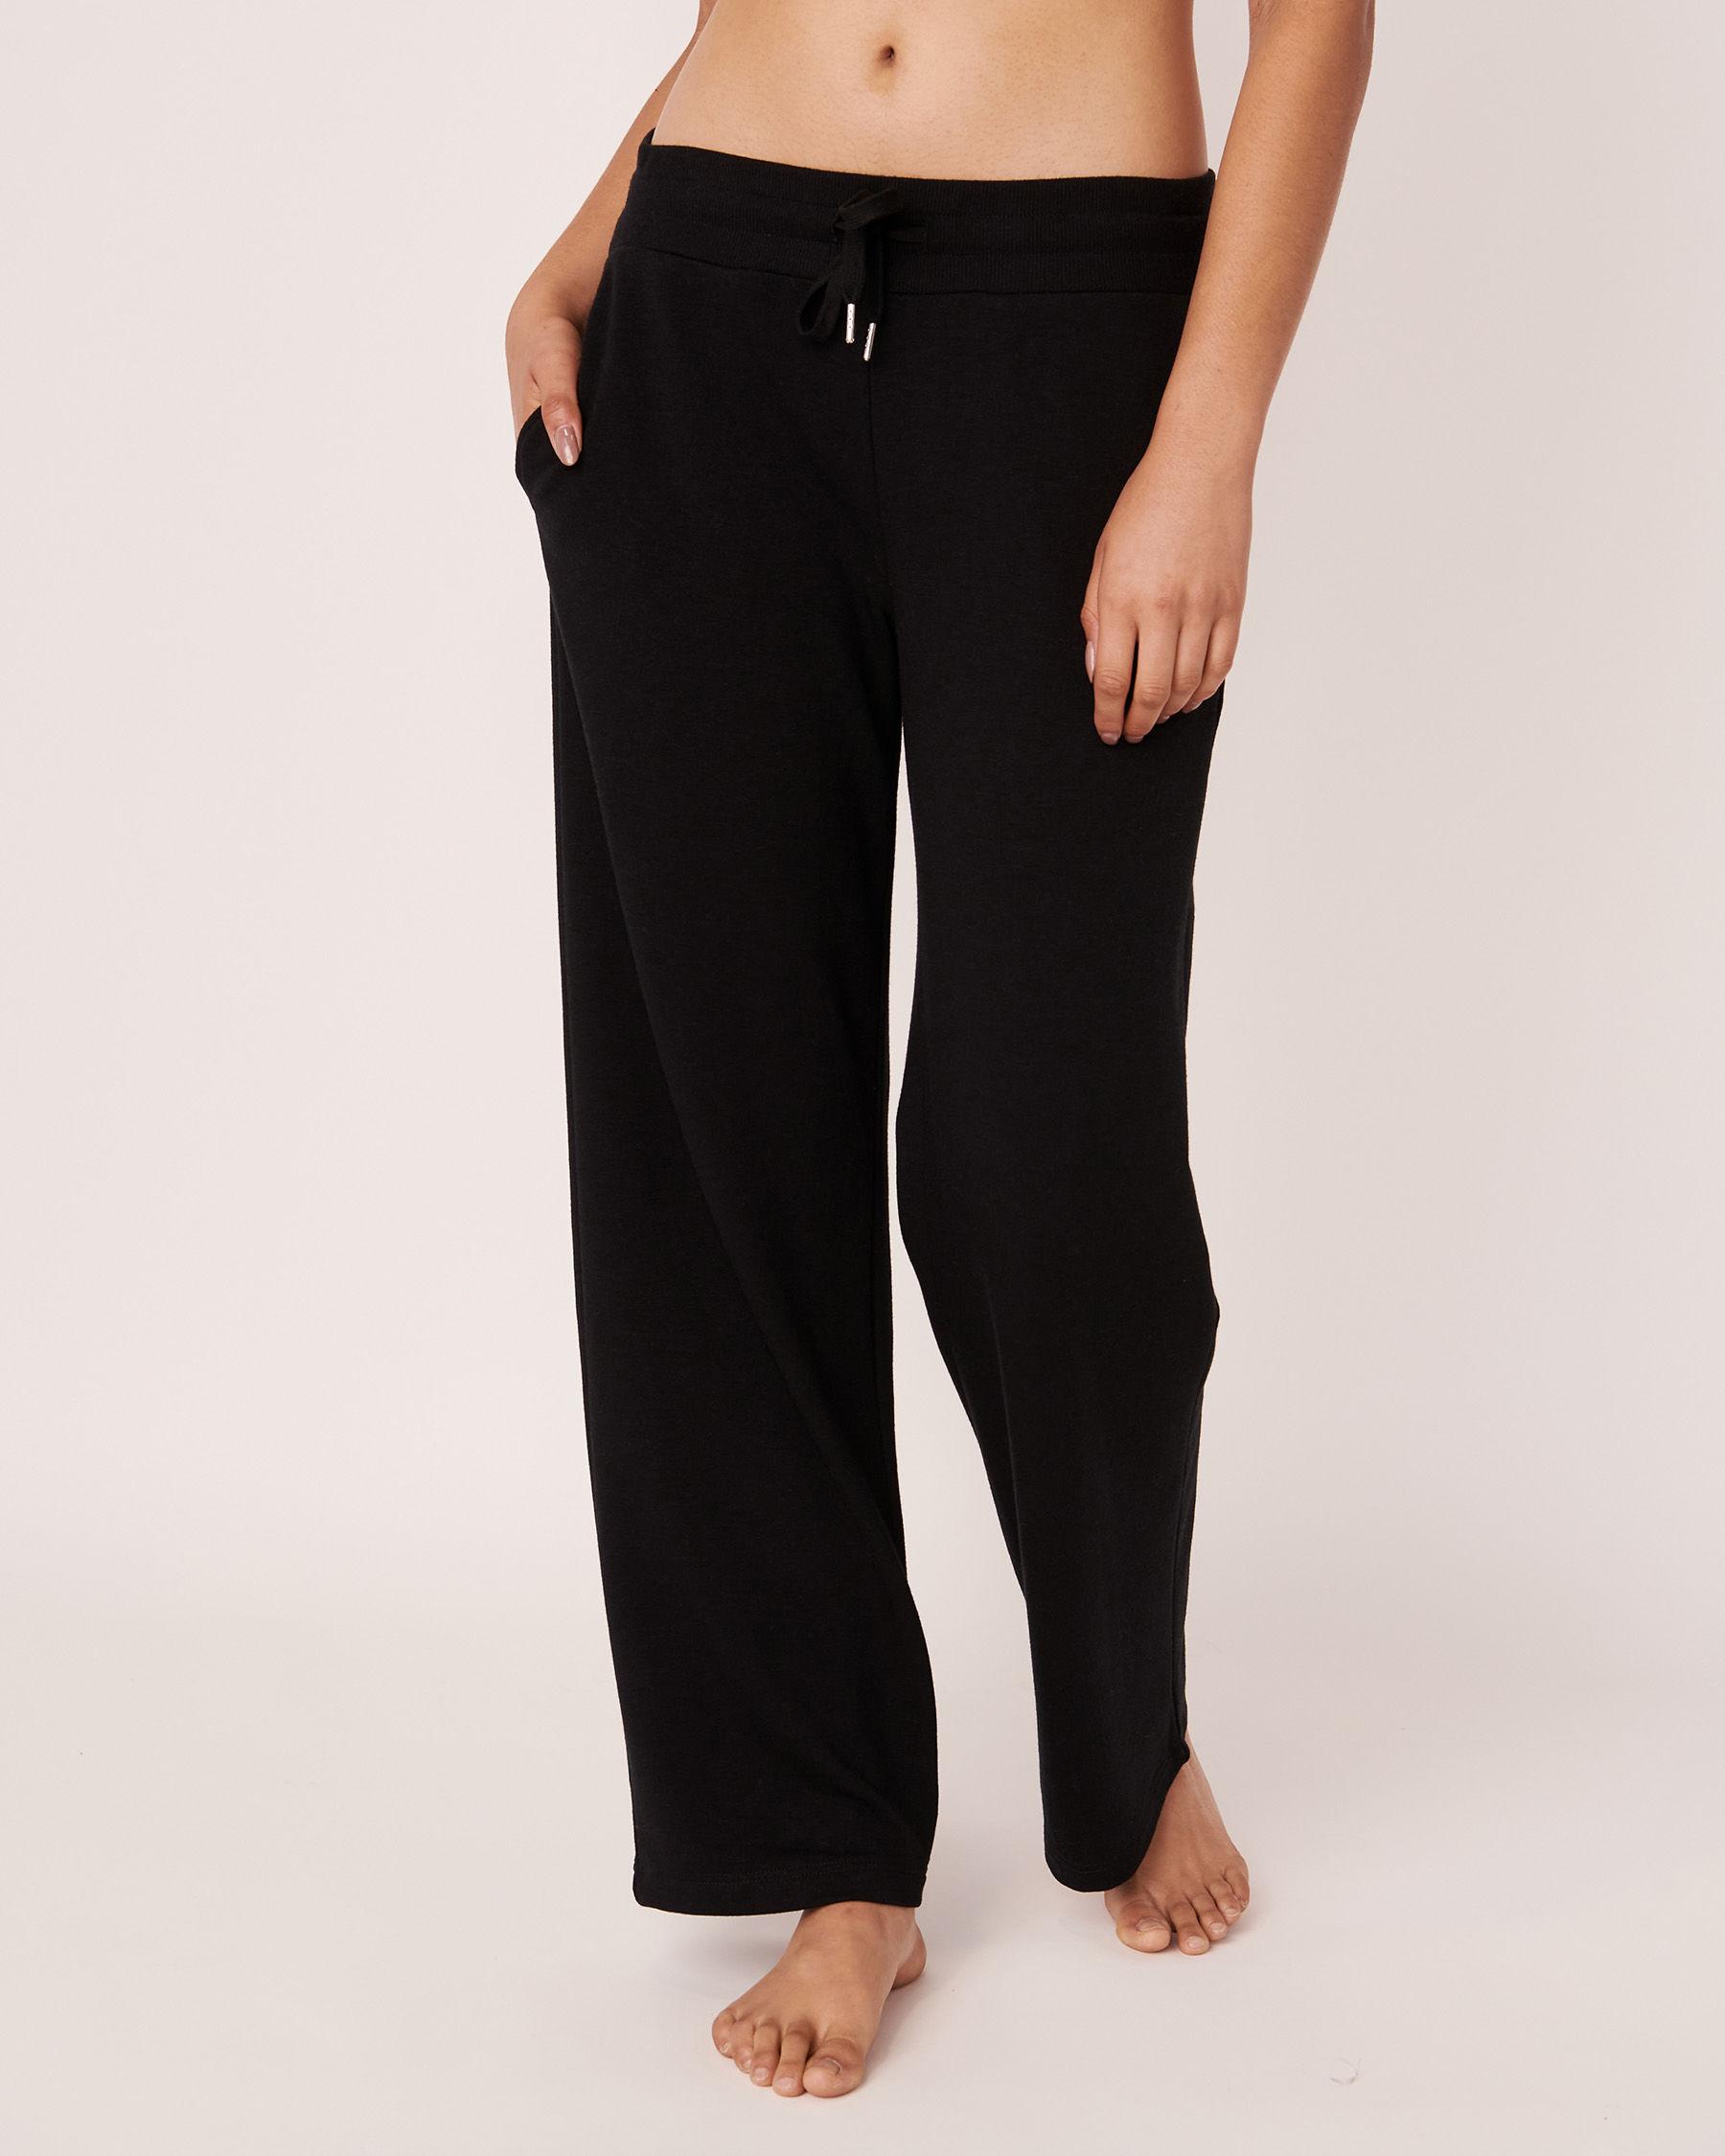 LA VIE EN ROSE Pantalon jambe large Noir 50200014 - Voir1